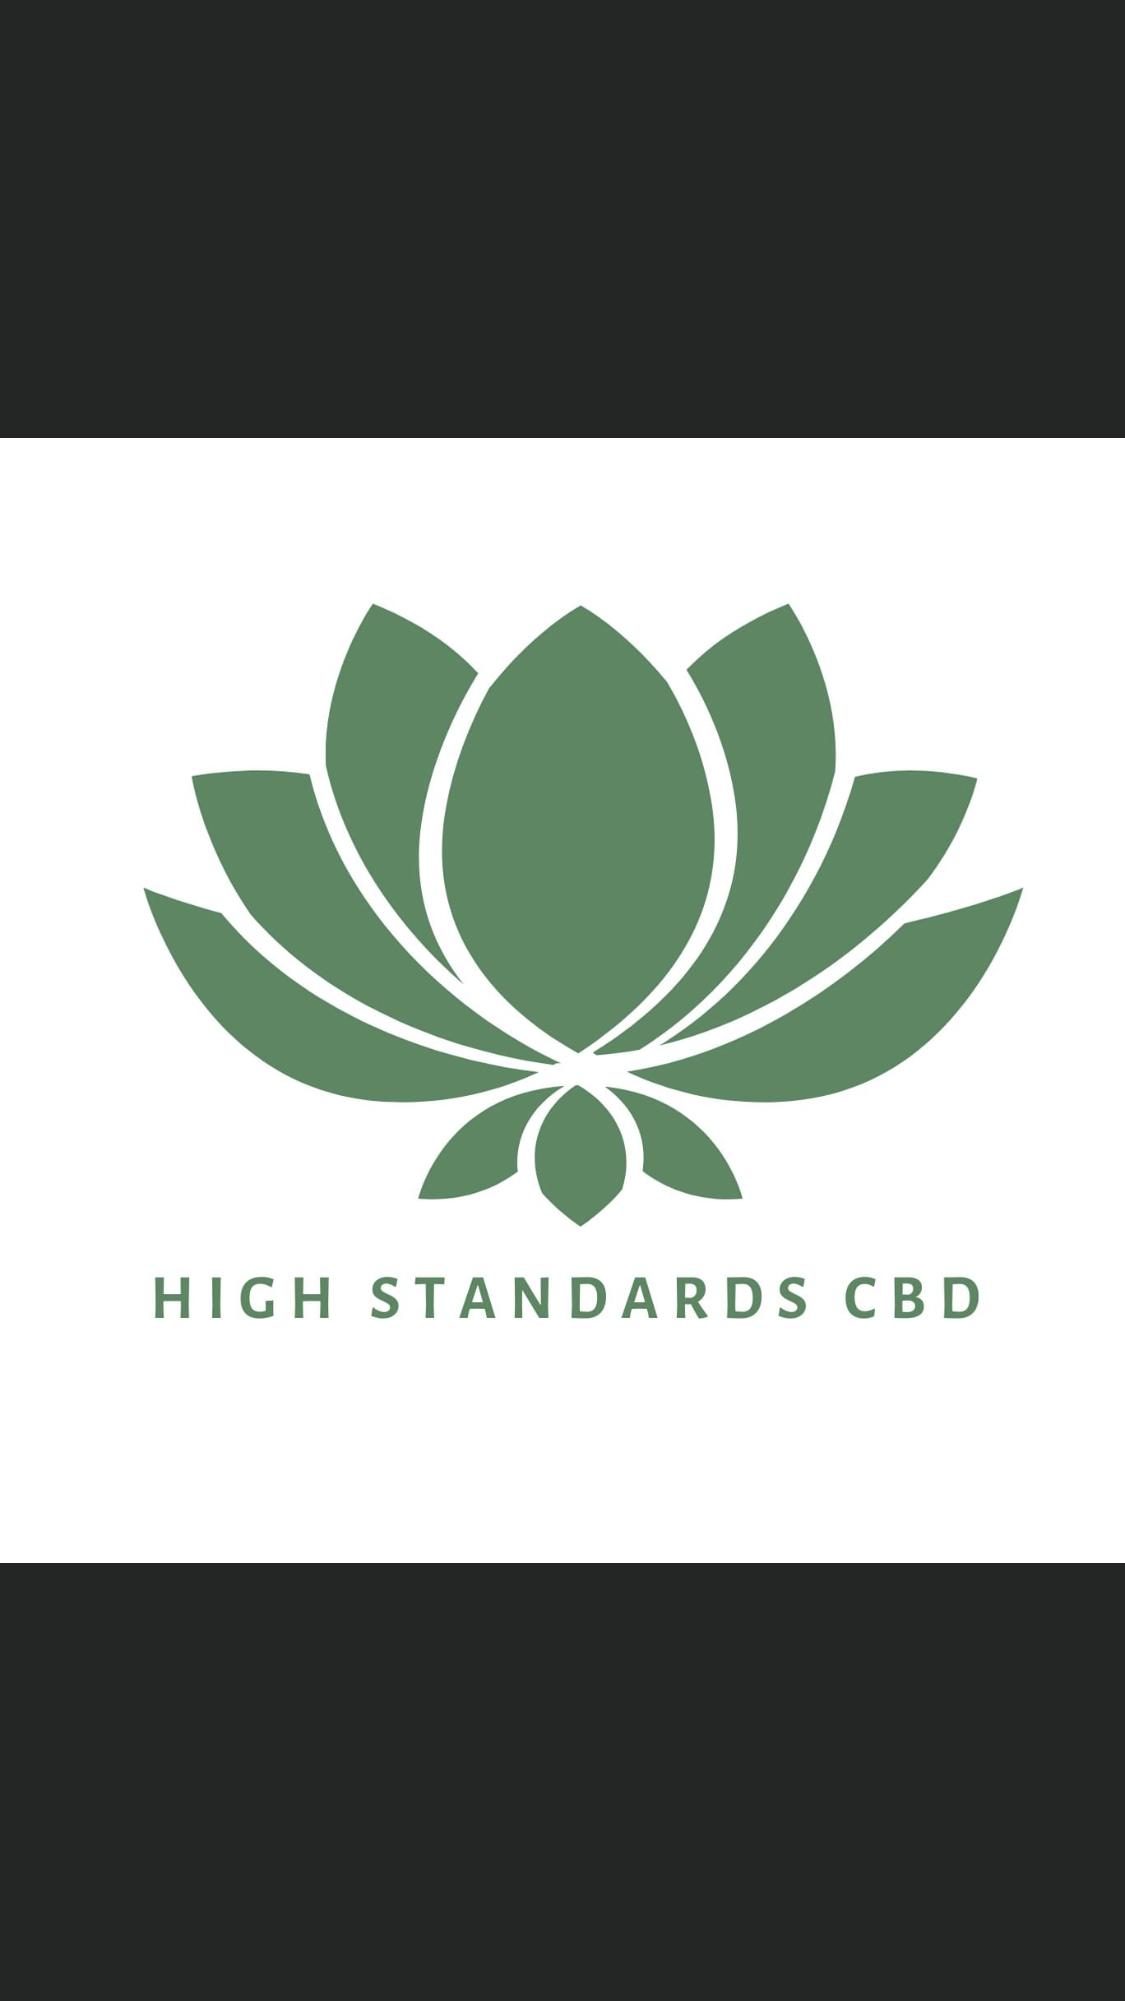 High Standards CBD